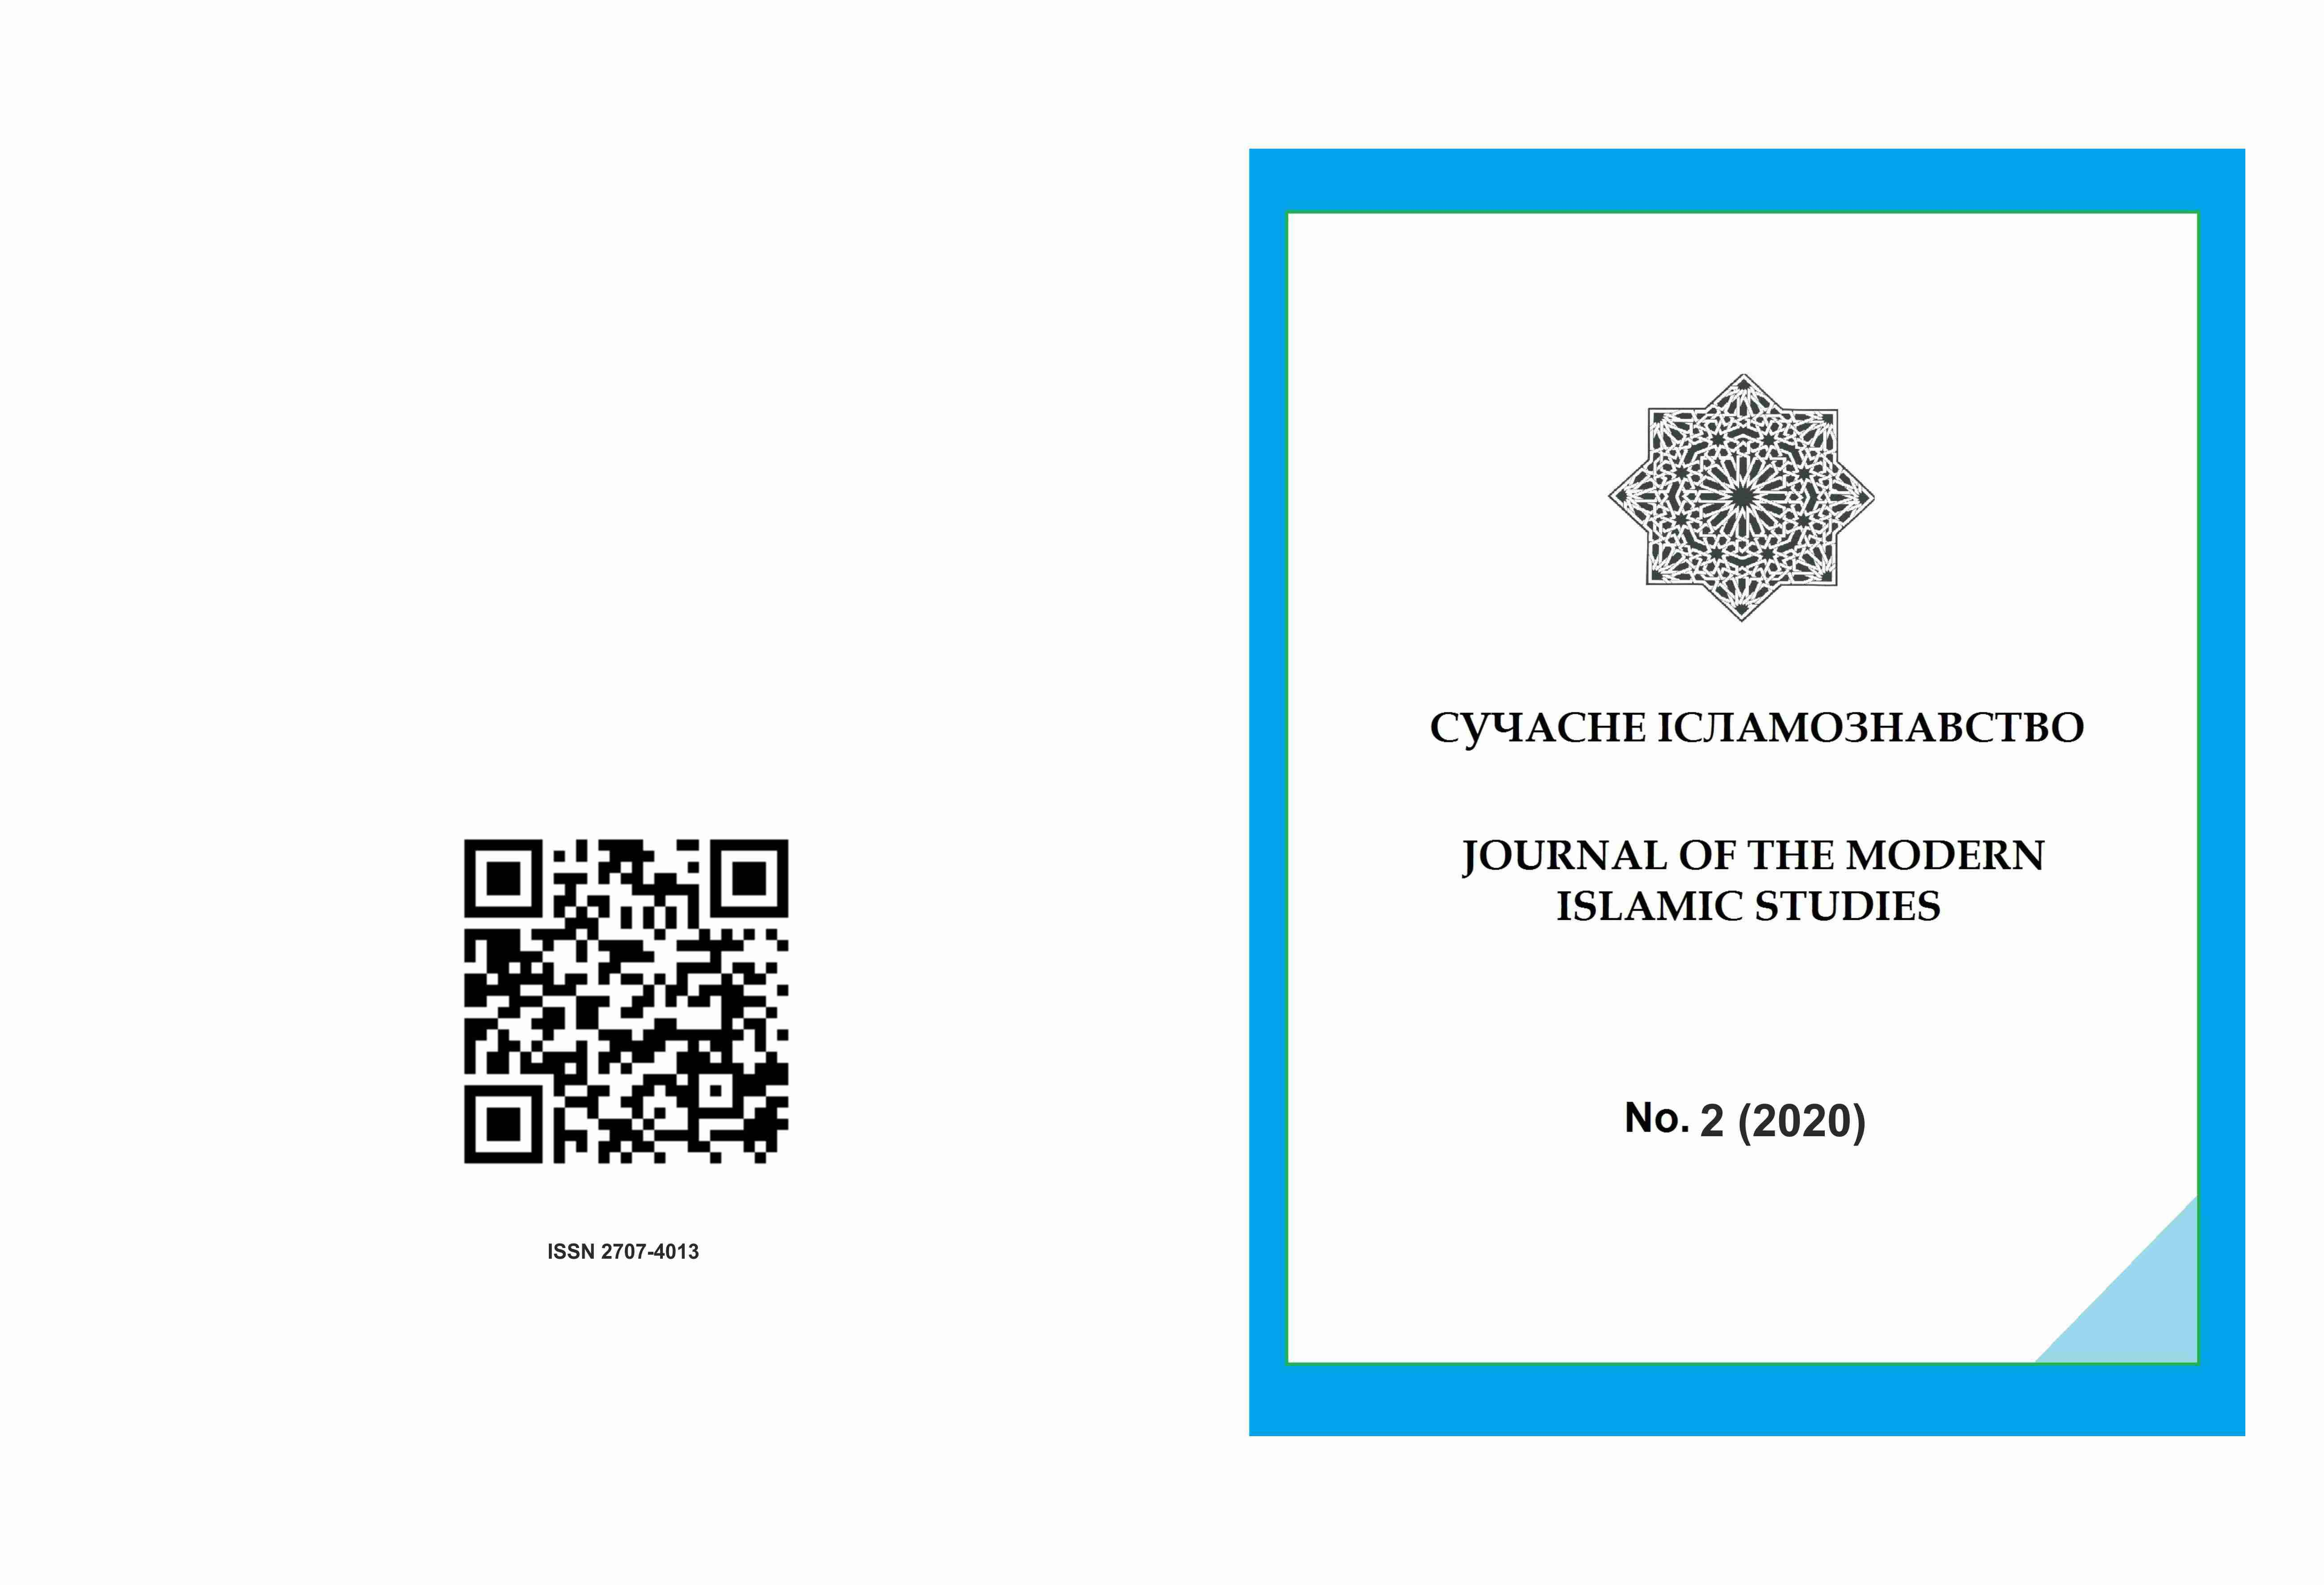 View No. 2 (2020): Journal of Modern Islamic Studies